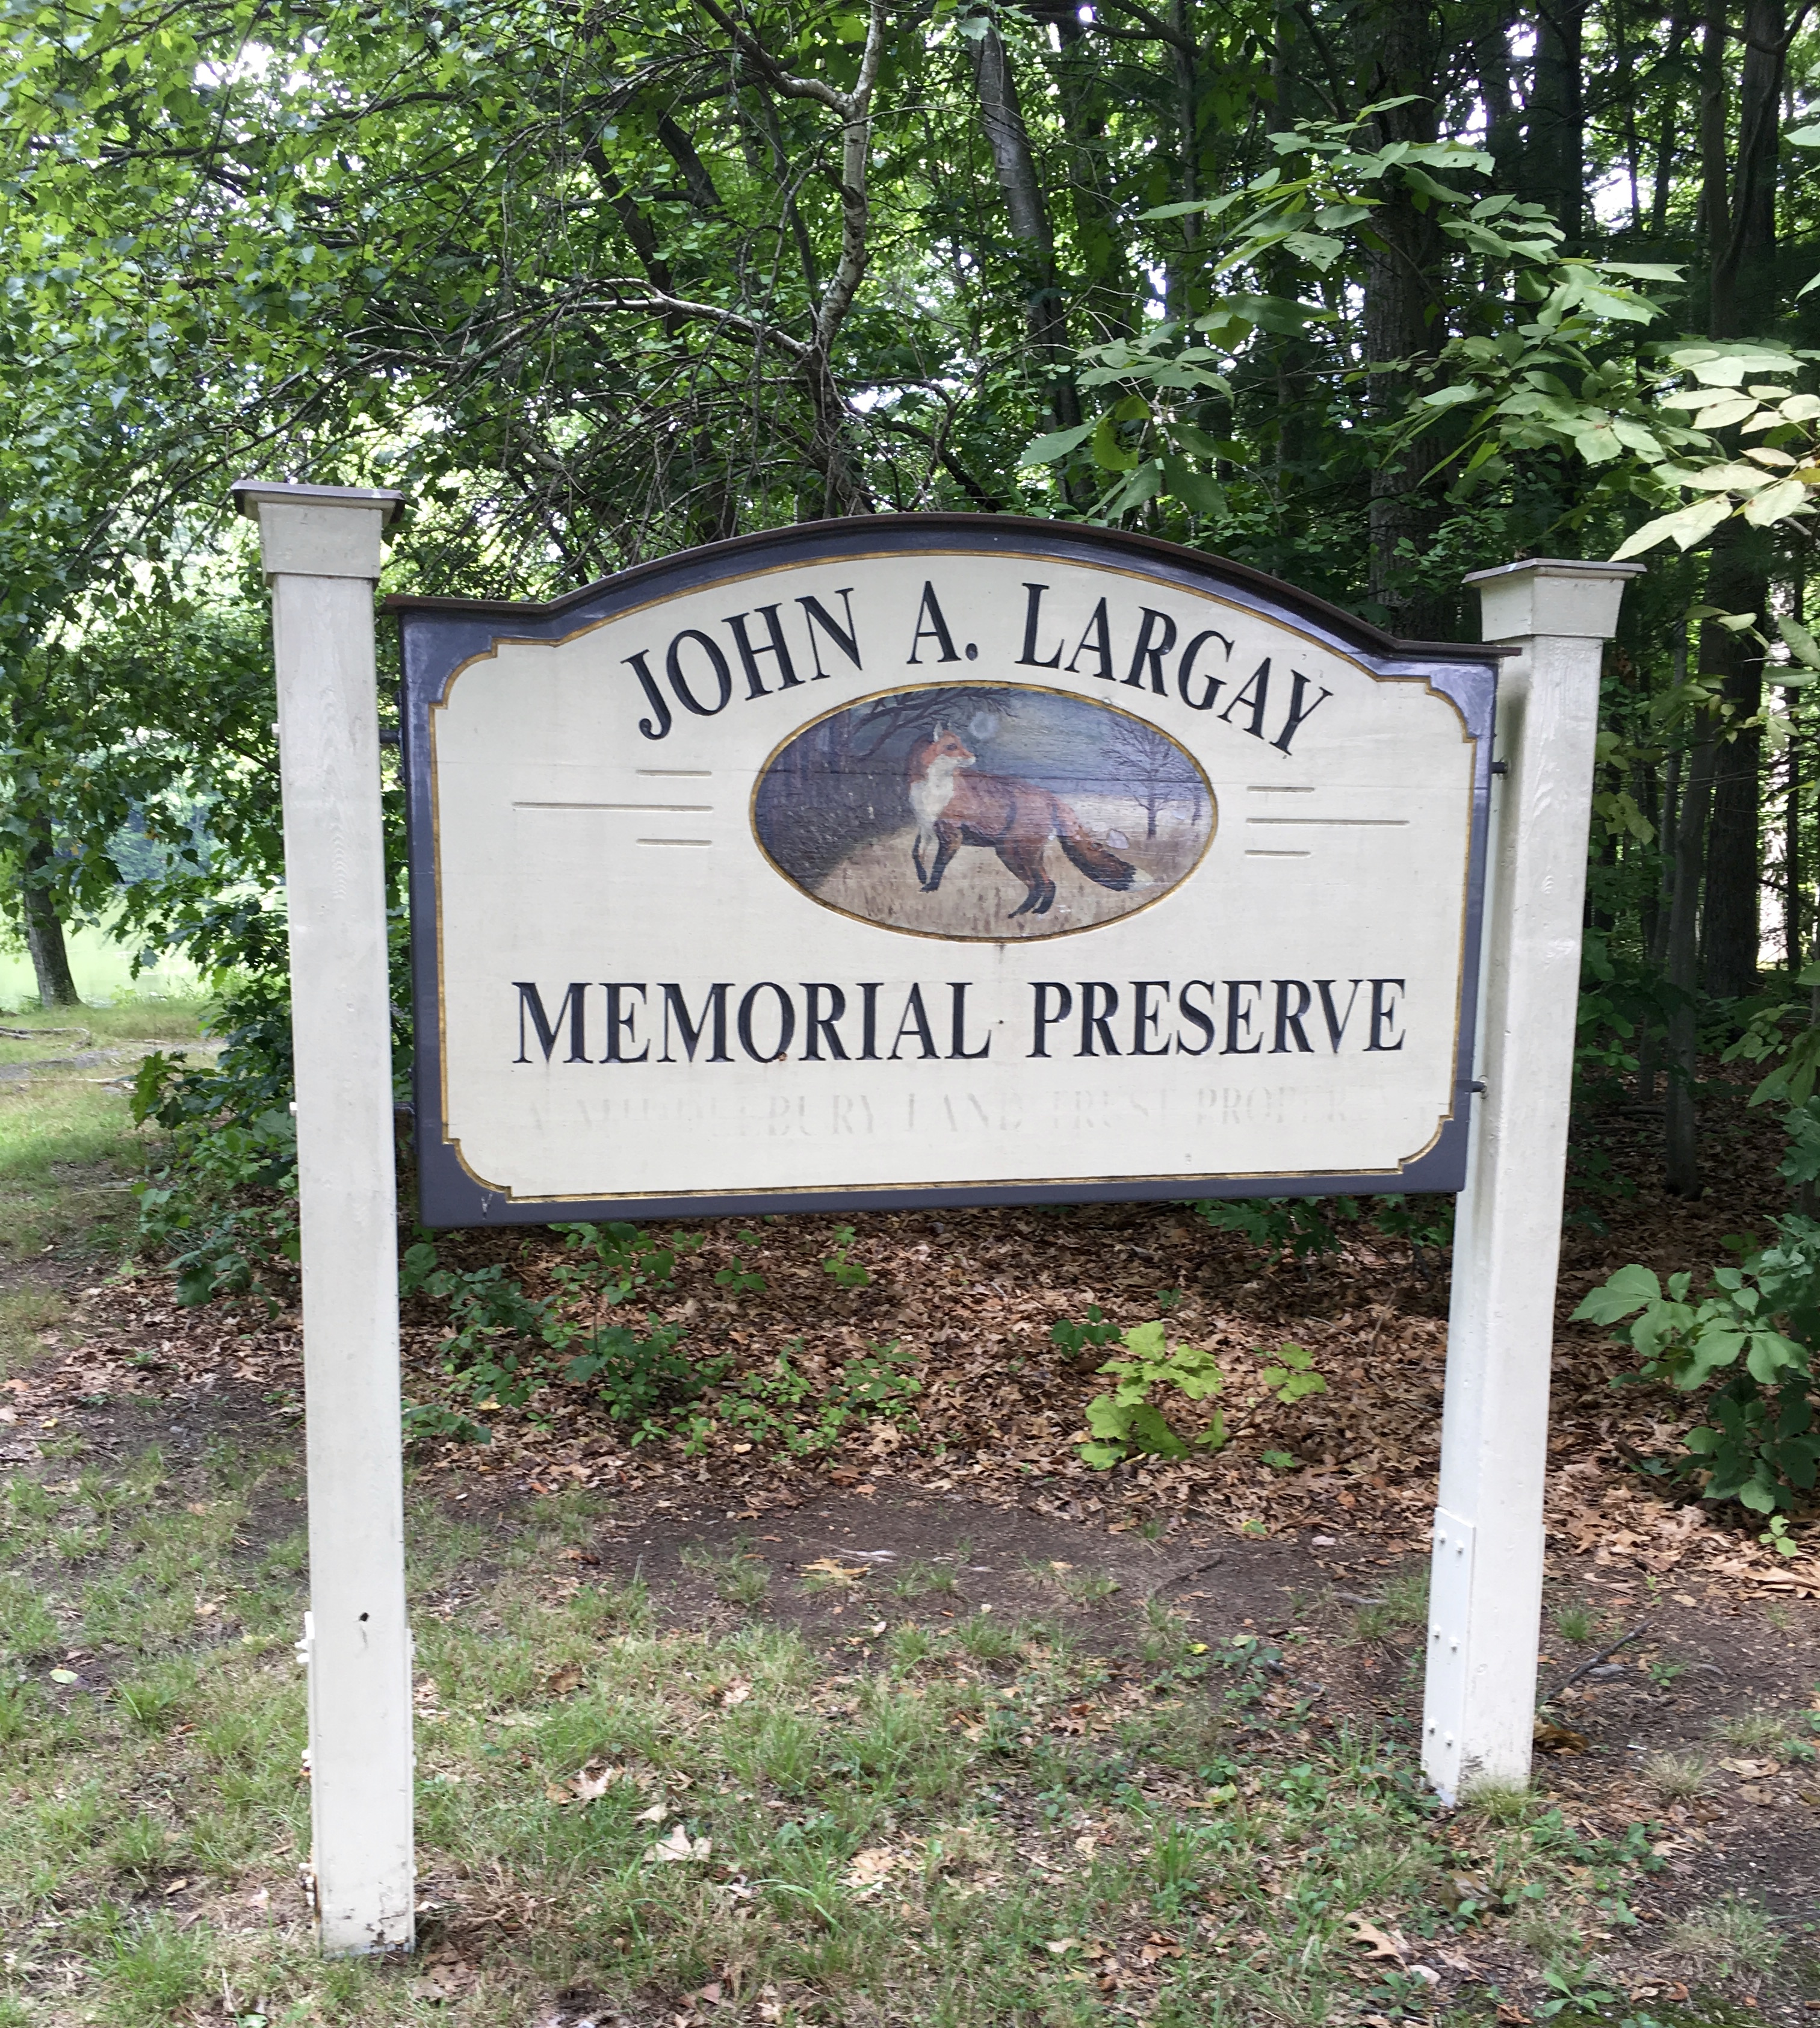 sign for memorial preserve